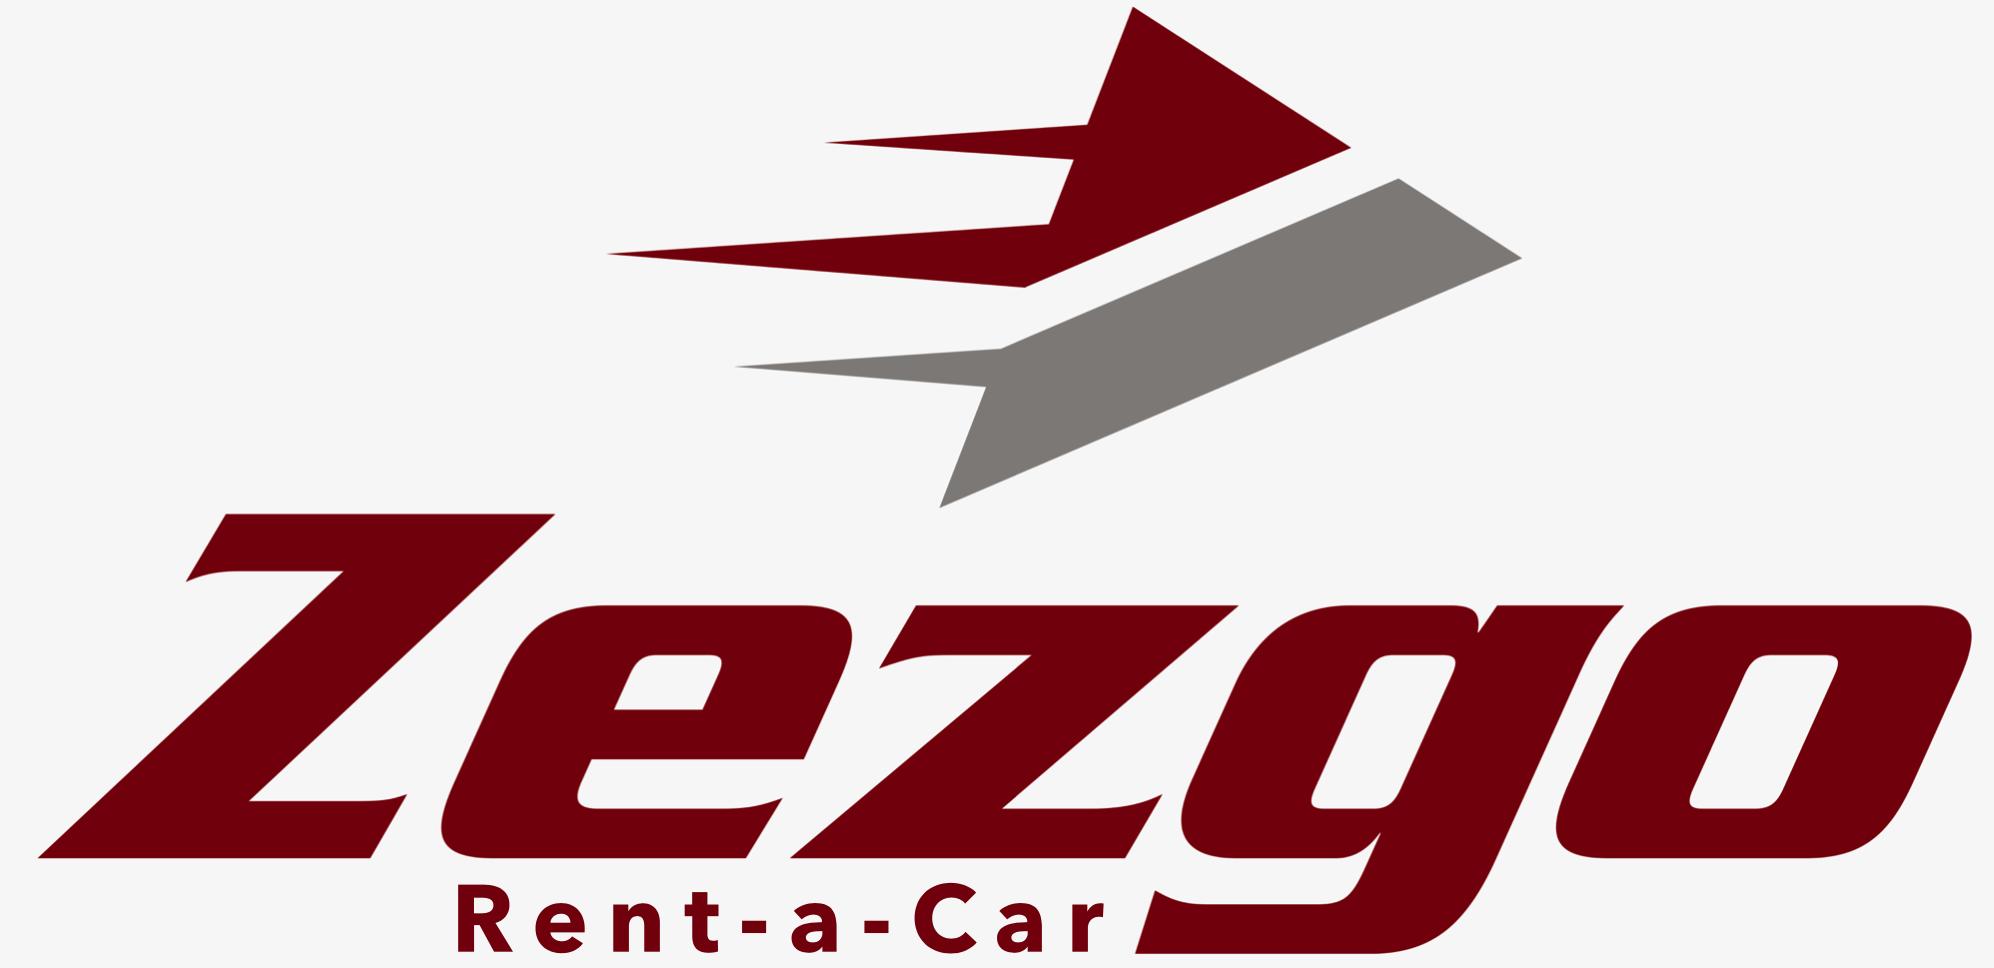 Zezgo Rent a Car